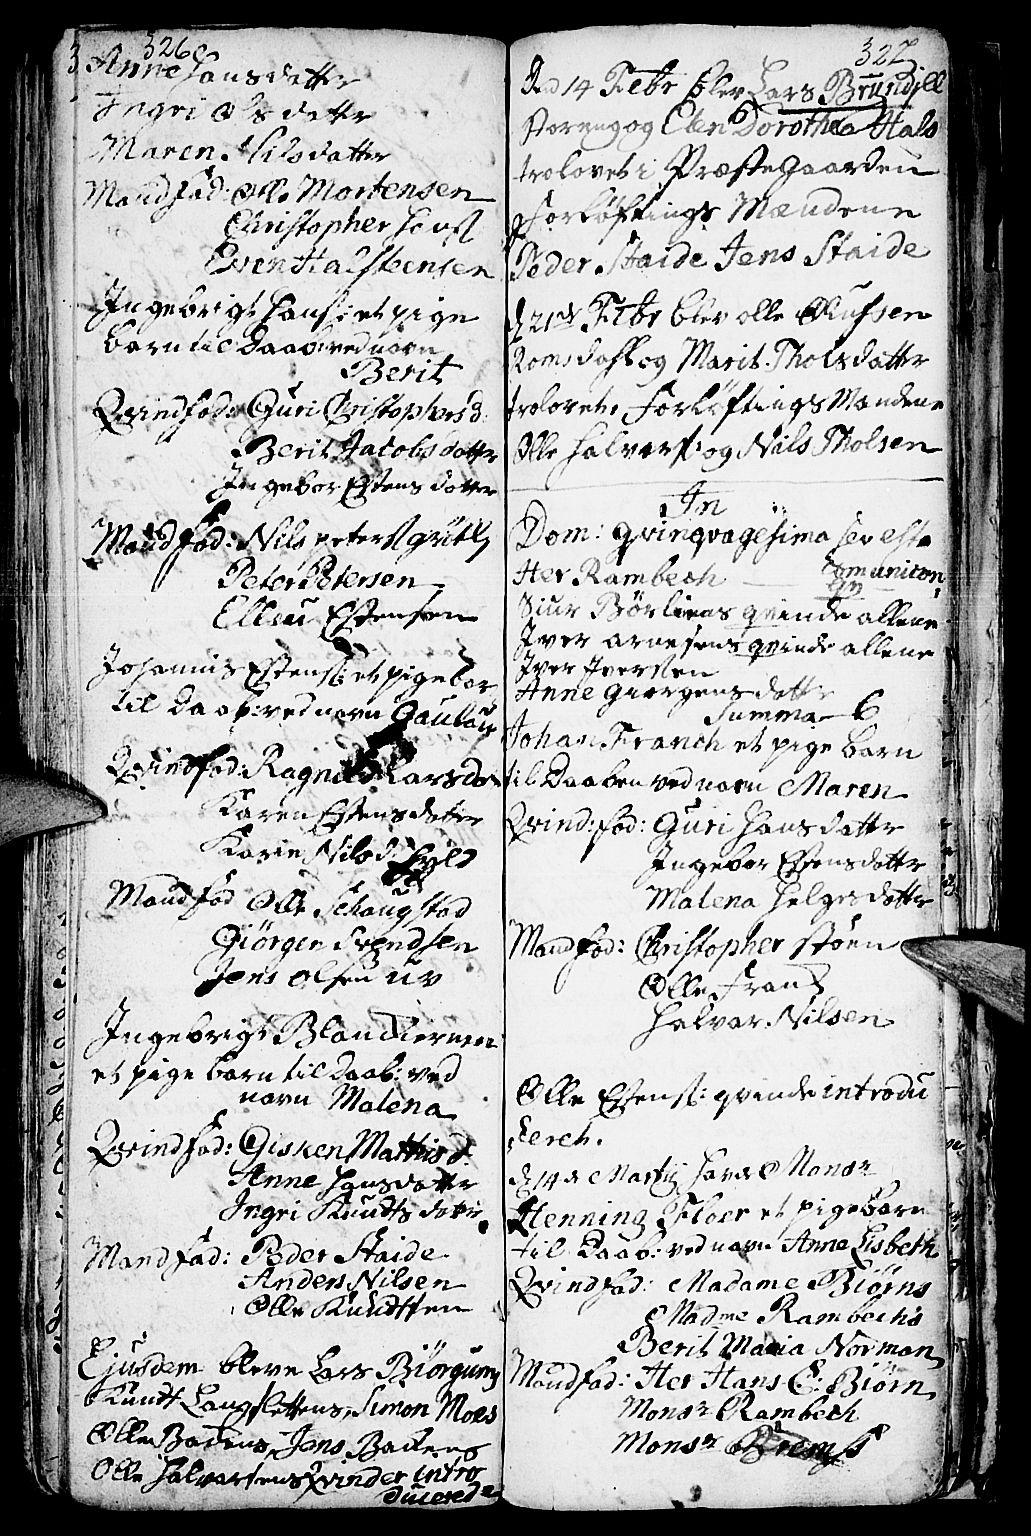 SAH, Kvikne prestekontor, Ministerialbok nr. 1, 1740-1756, s. 326-327